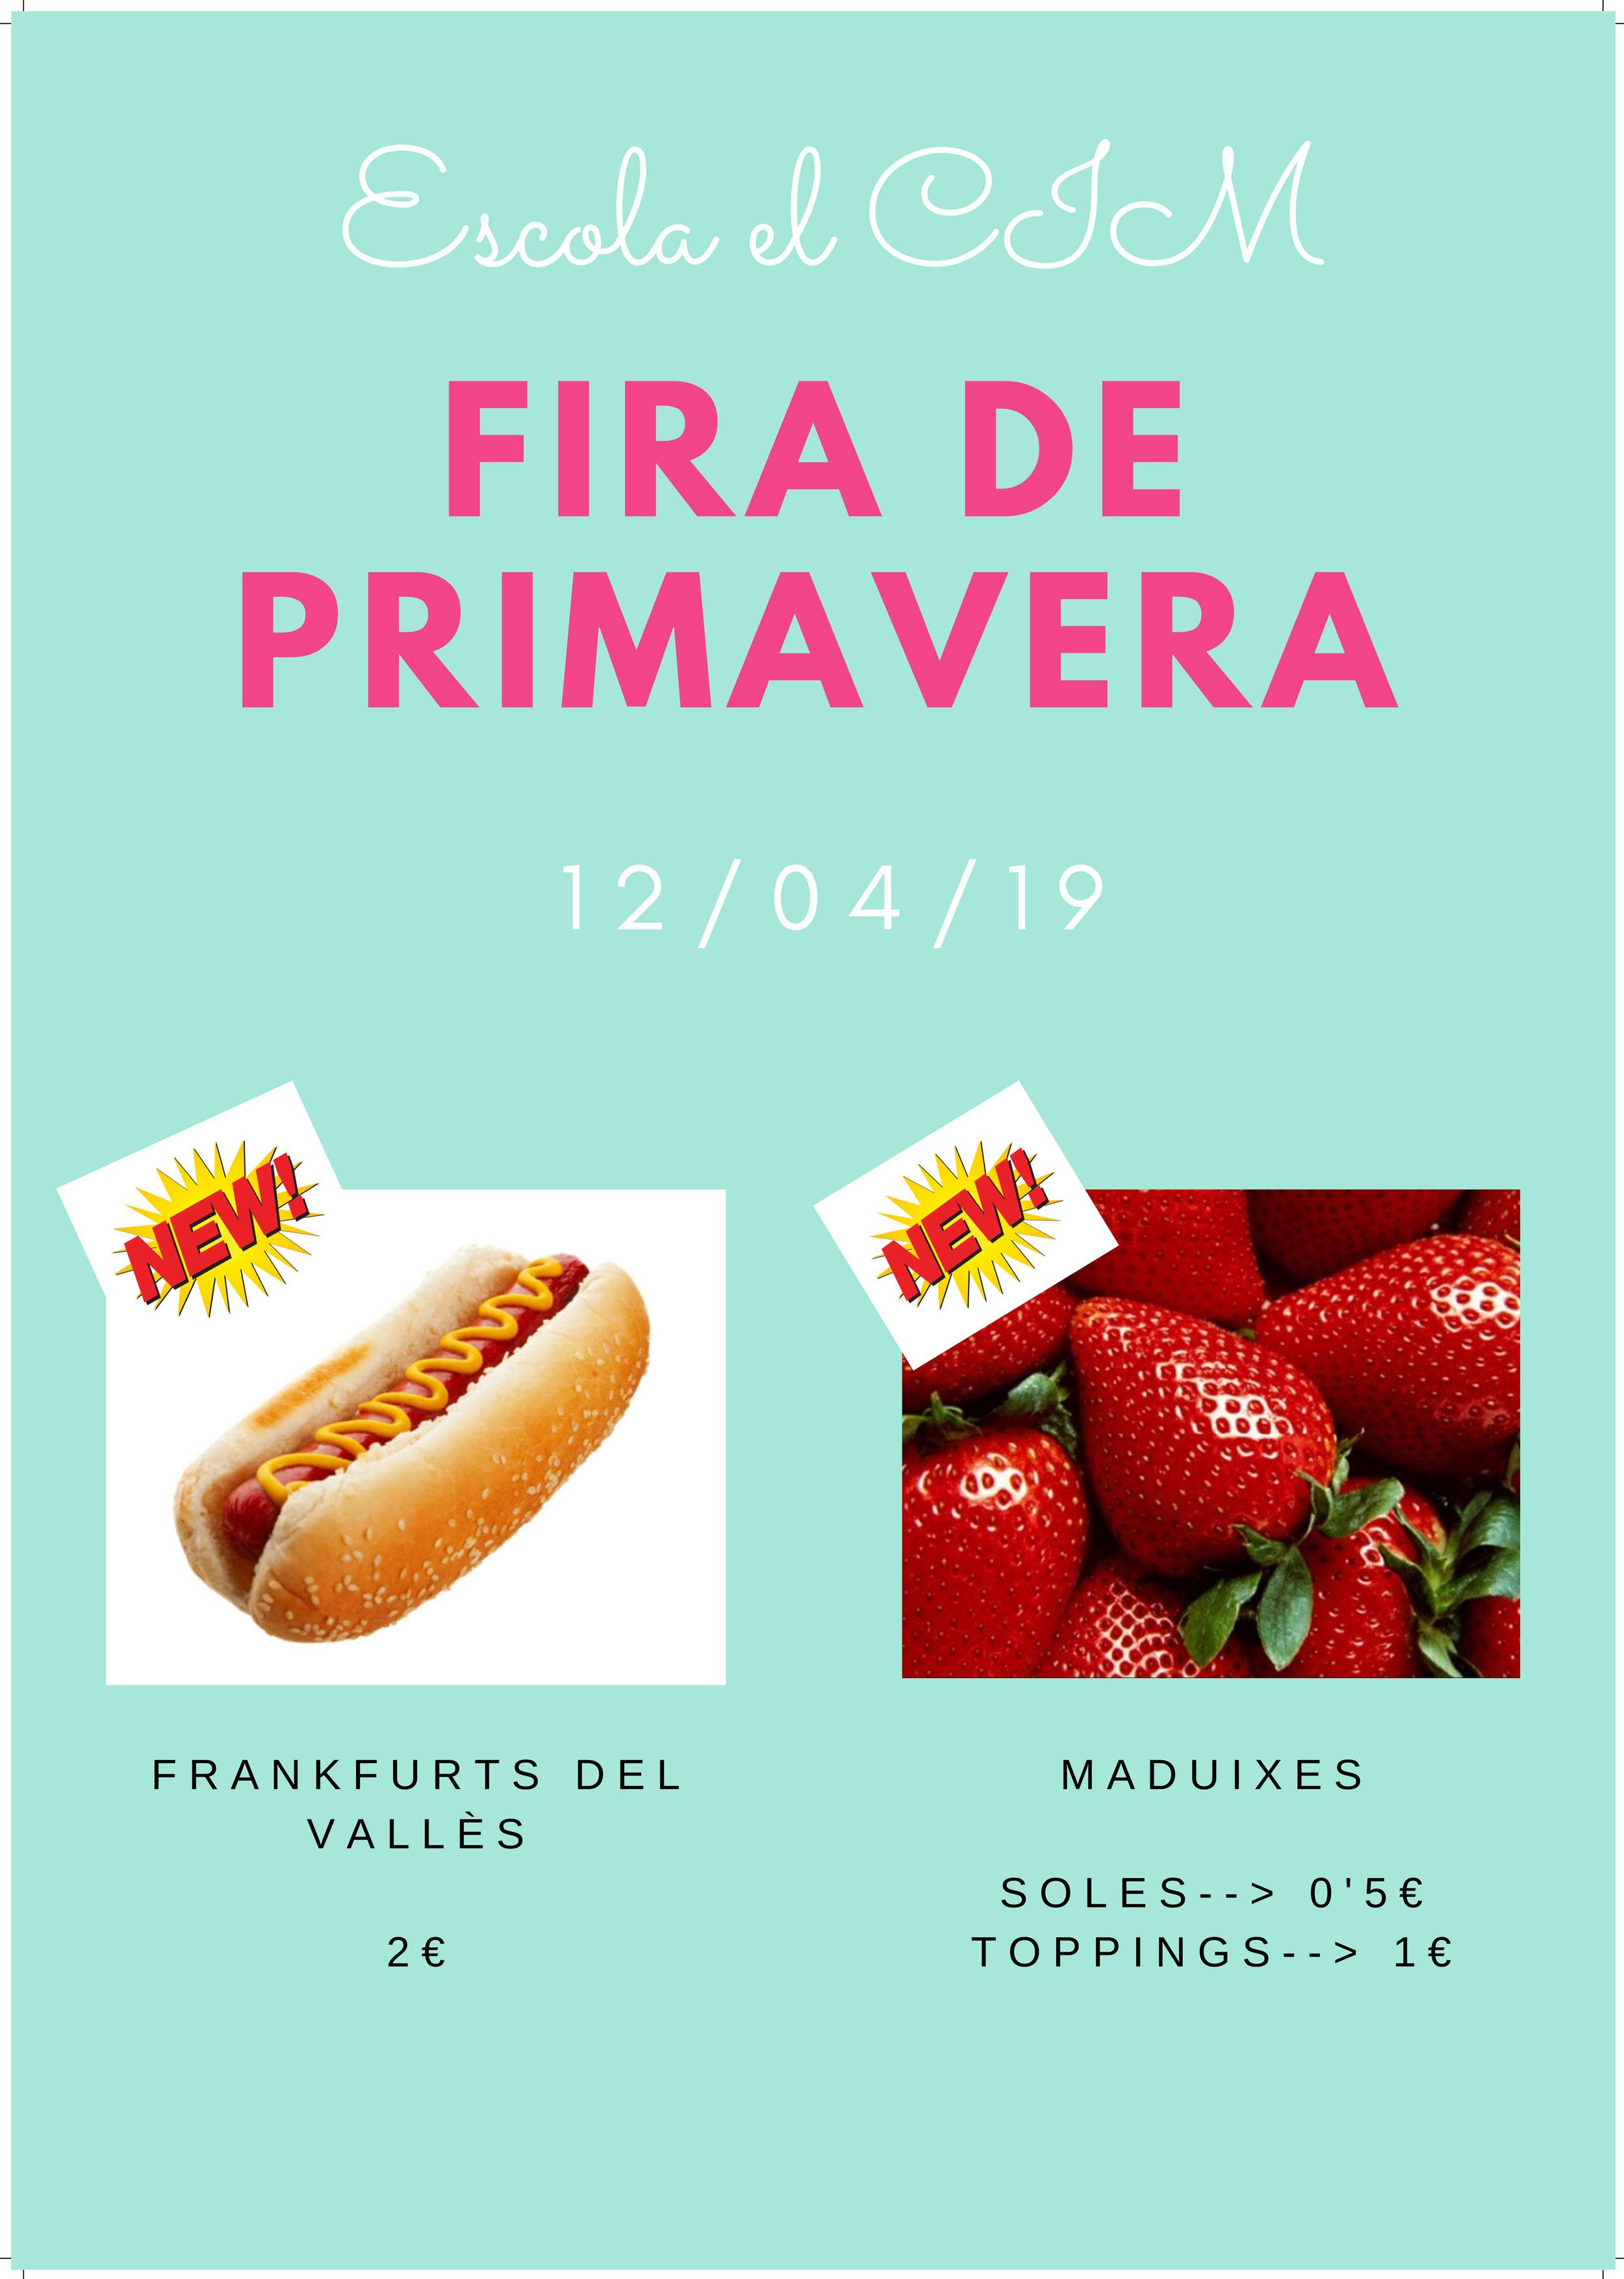 FIRA DE PRIMAVERA